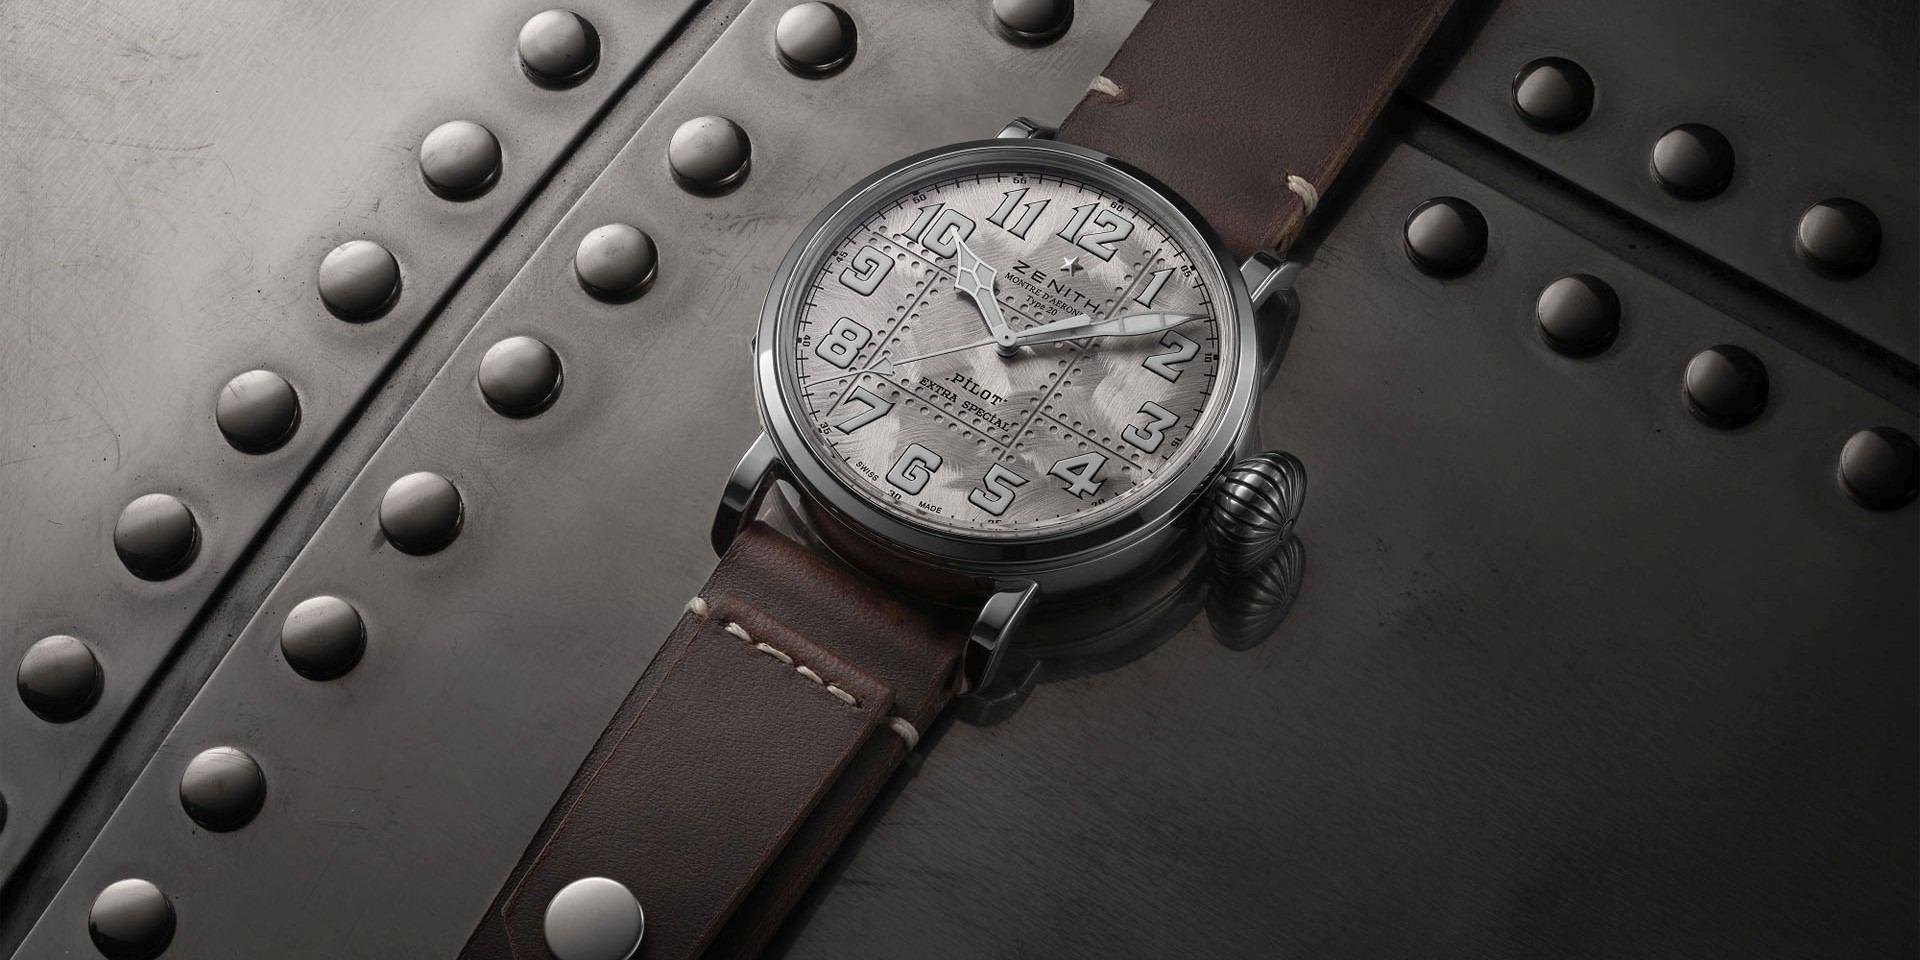 【2019 Pre-Basel報導】翱翔天際的銀色翅膀:ZENITH Pilot Type 20 Extra Special Silver 腕錶